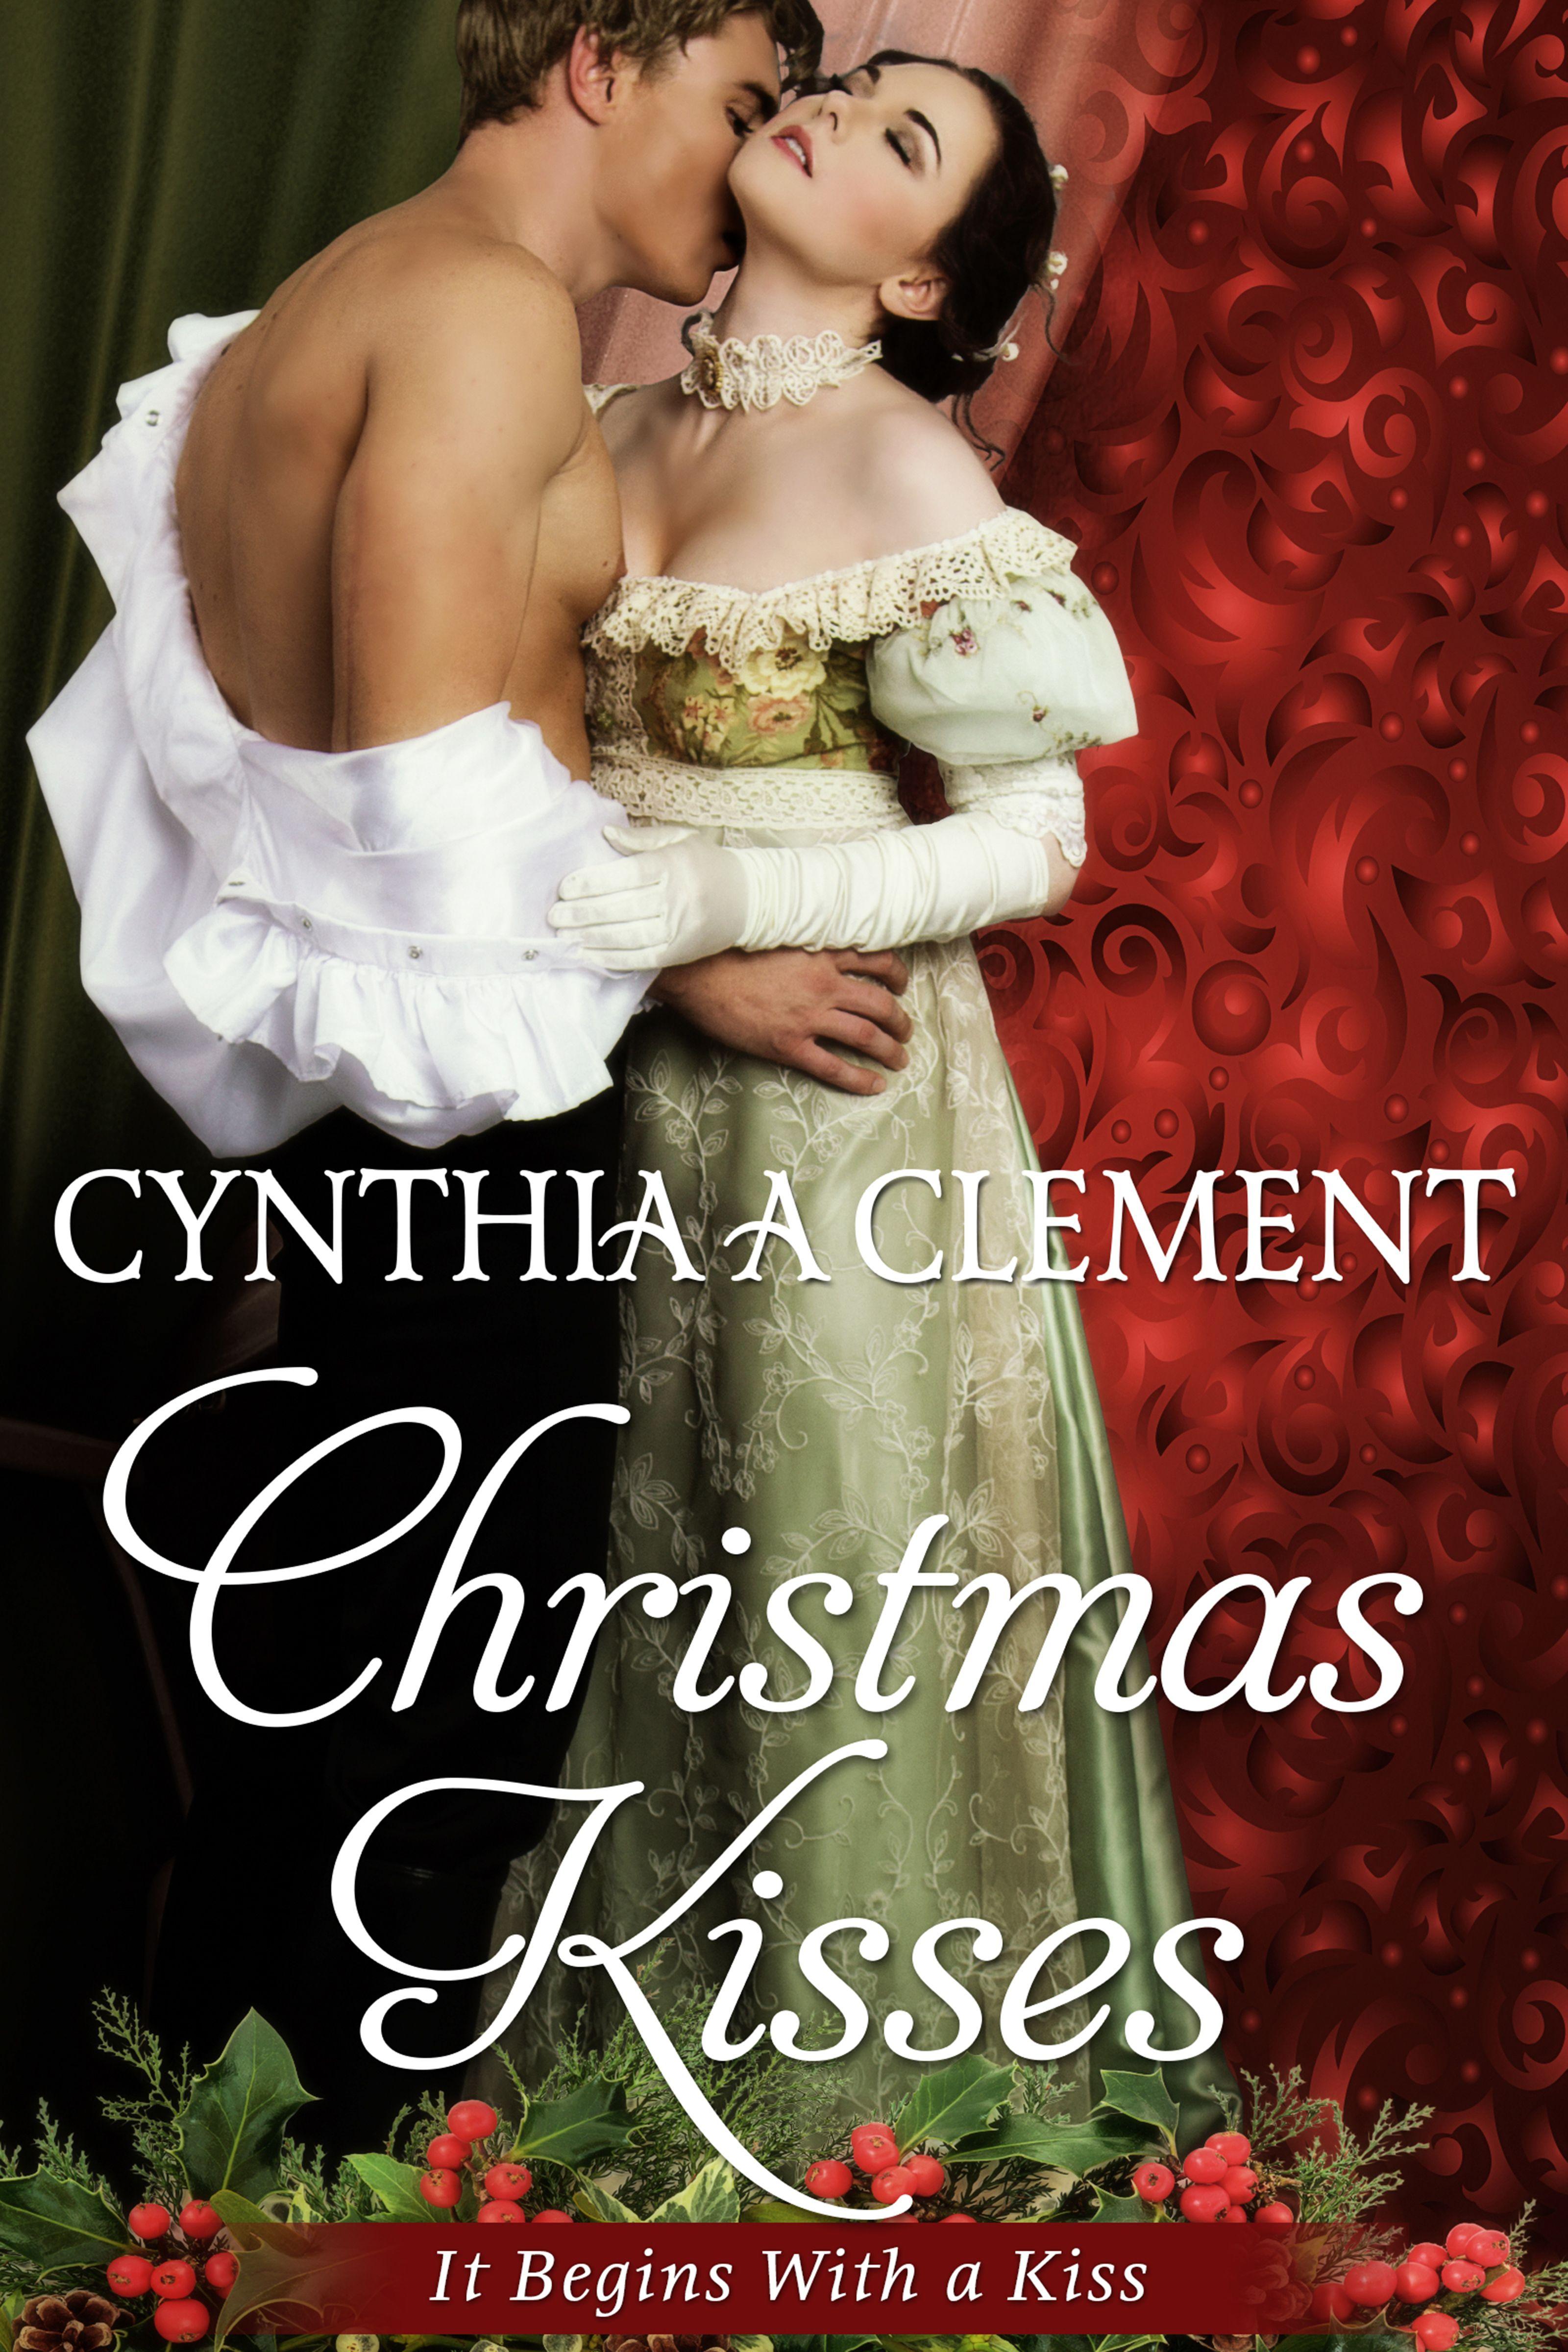 Cynthia A. Clement - Christmas Kisses